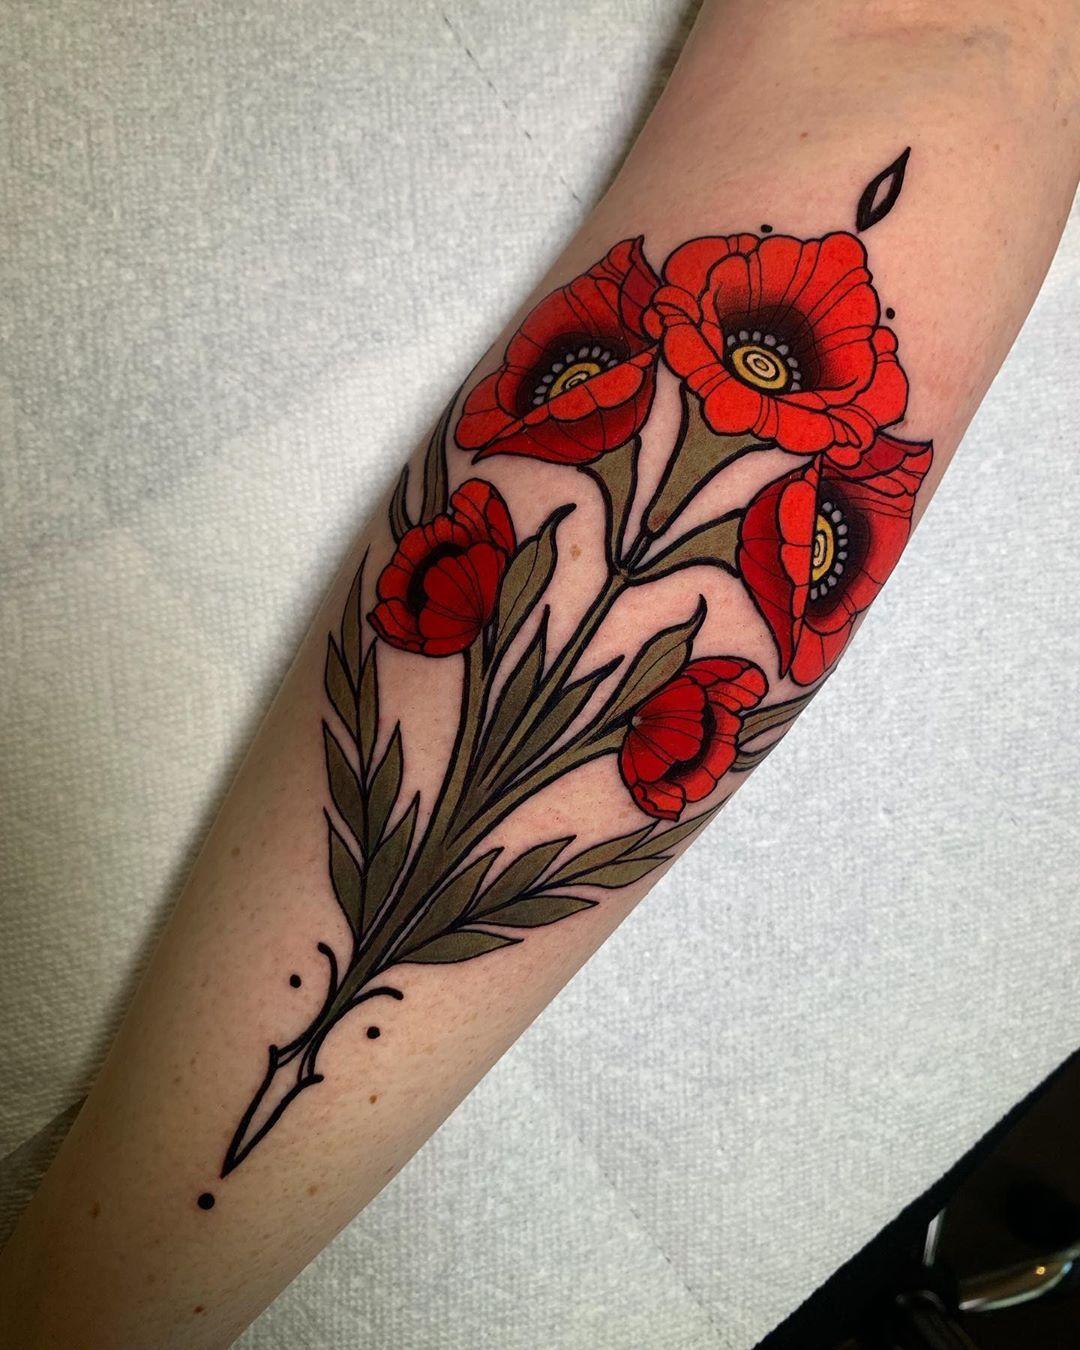 Floral Art Deco Art Nouveau Ornament From Today At Lovelesstattoo Thank You Julie Tattoos Beautiful Tattoos Nouveau Tattoo